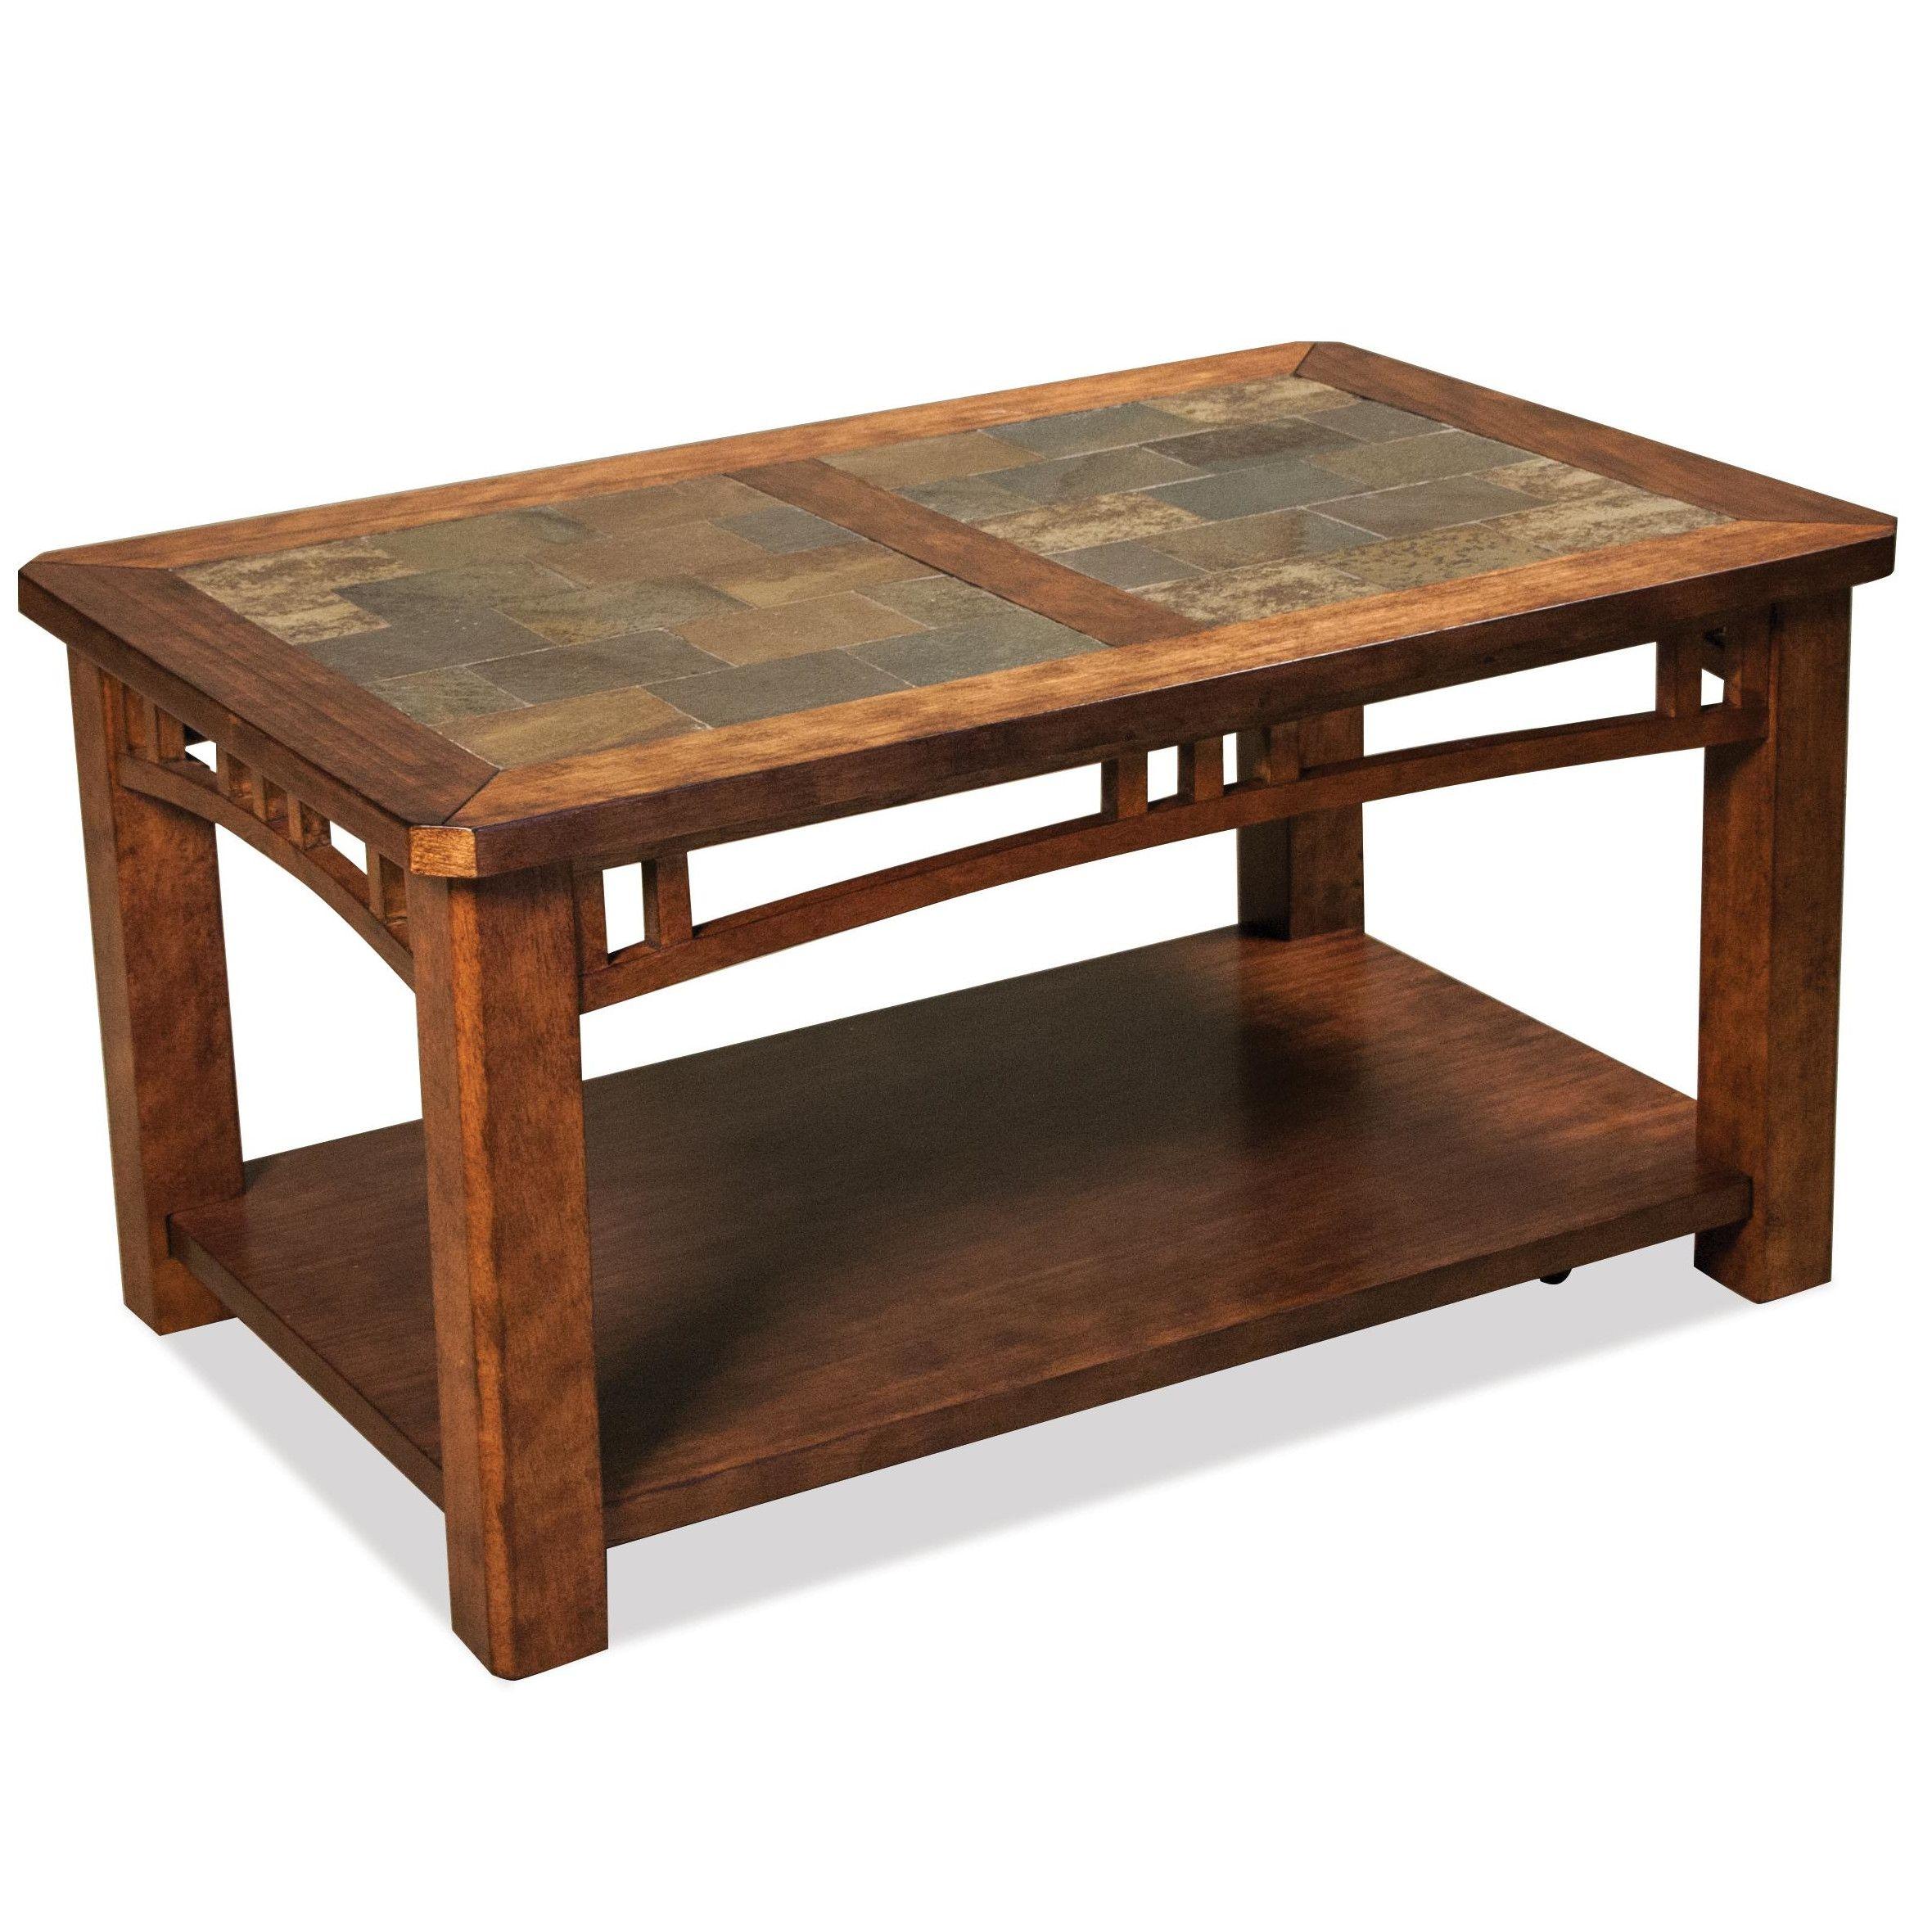 Axel Vervoordt S Floating Stone Coffee Table In Slate And Stone Image Via Axelvervoordt Stone Coffee Table Window Coffee Table Slate Coffee Table [ 899 x 899 Pixel ]